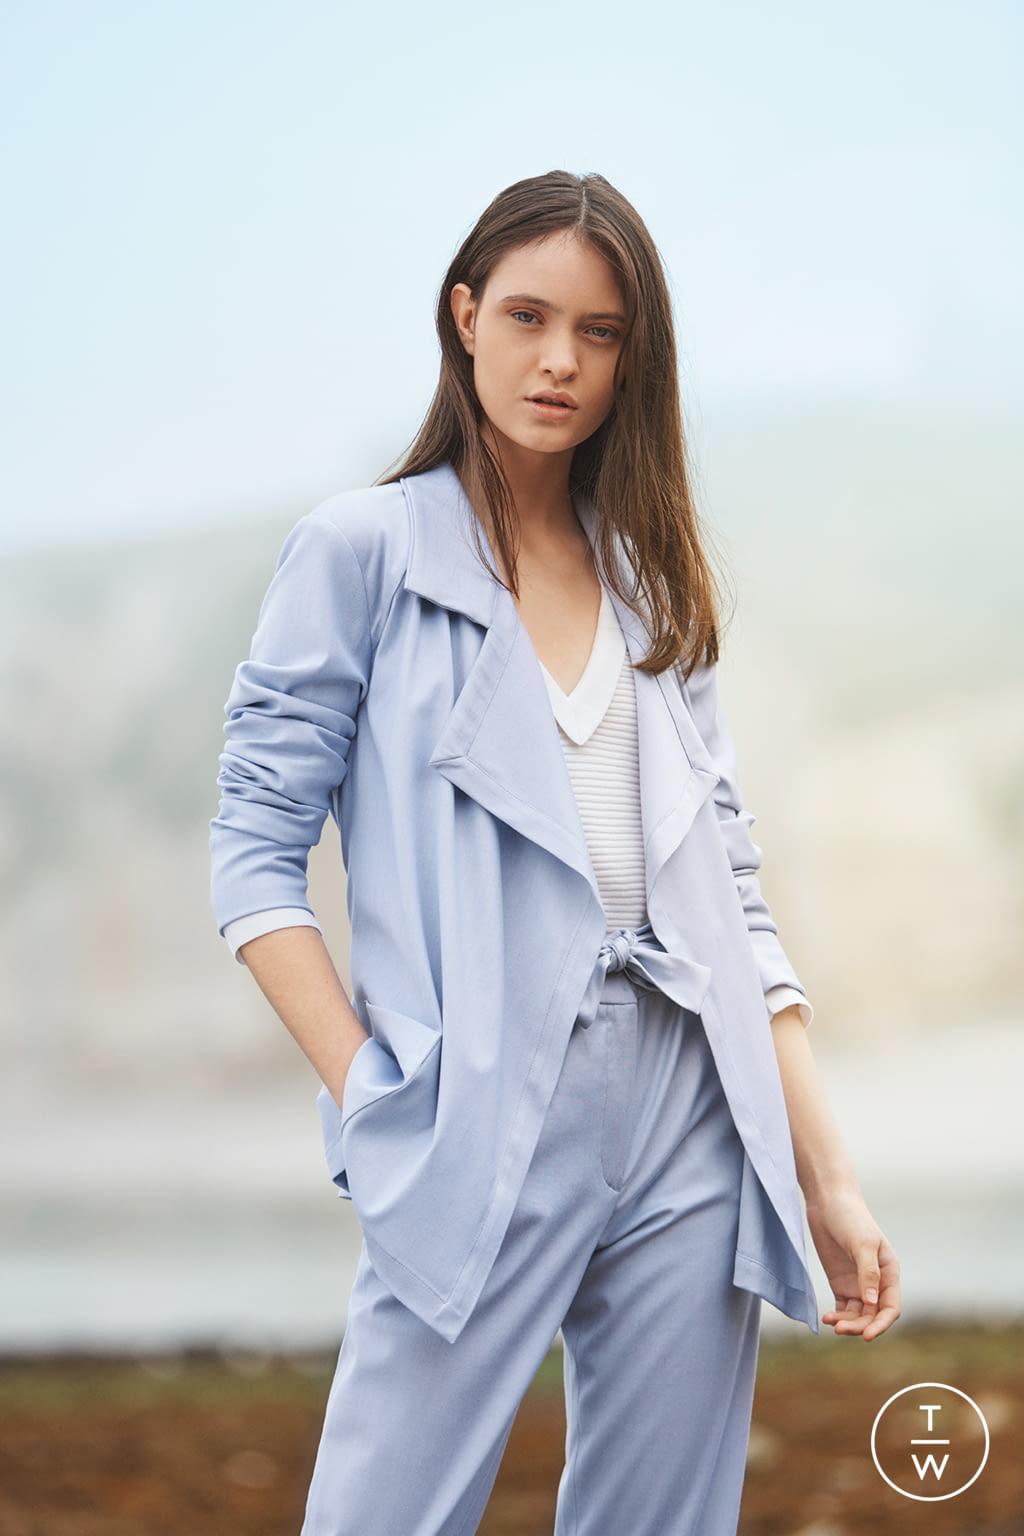 Fashion Week Paris Spring/Summer 2019 look 13 de la collection Maison Ullens womenswear